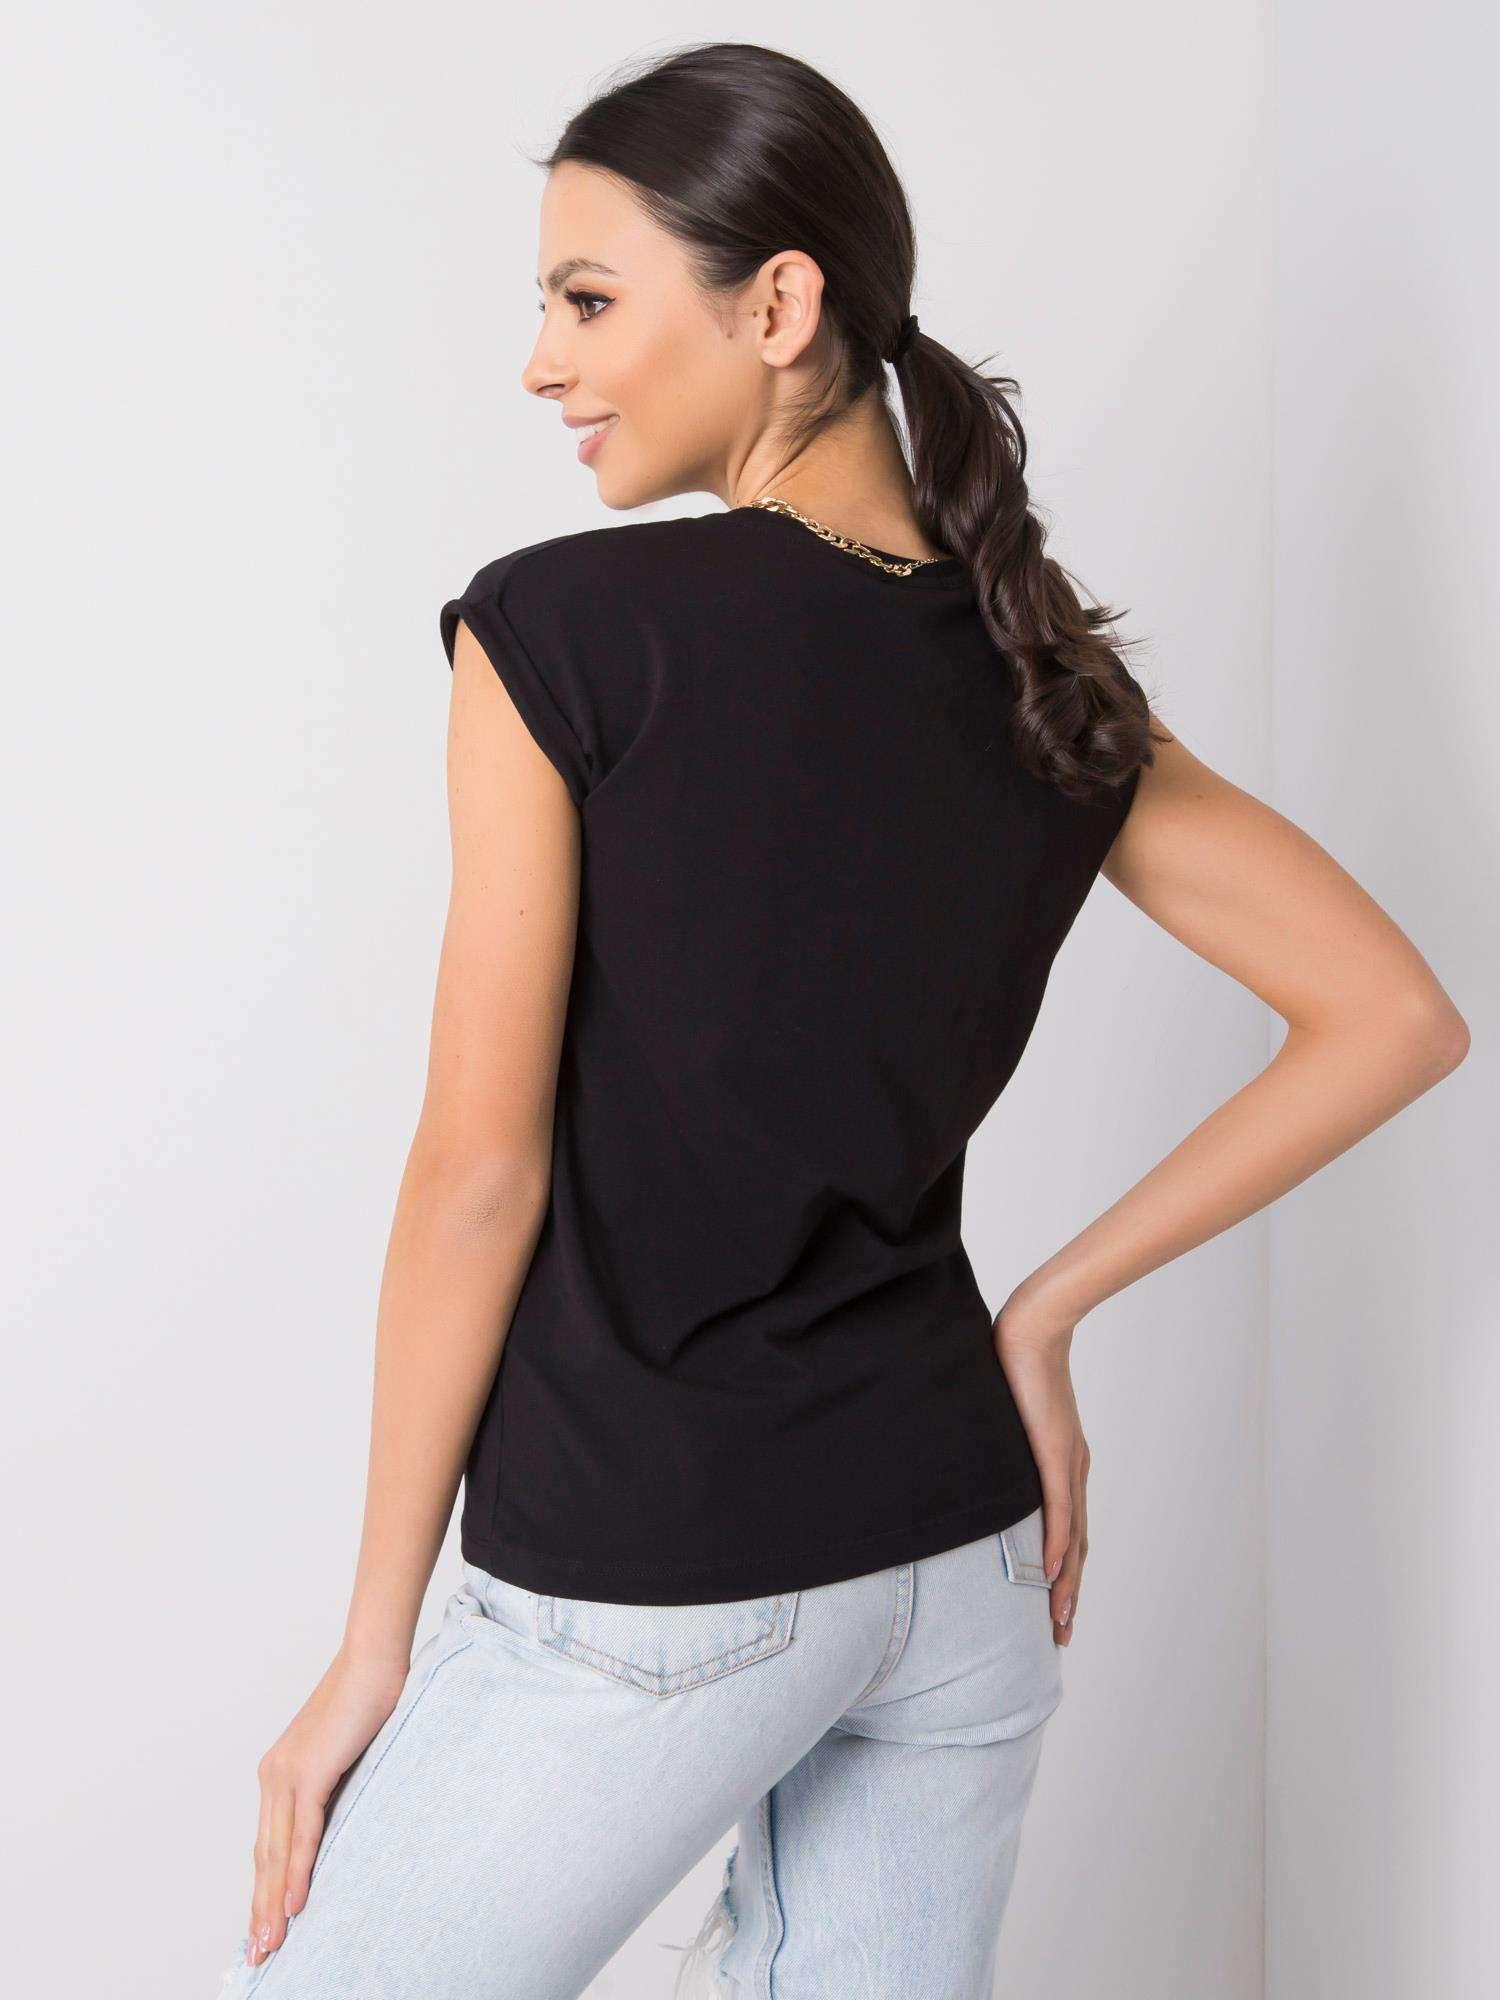 T-Shirt in Schwarz mit V-Ausschnitt Rückansicht